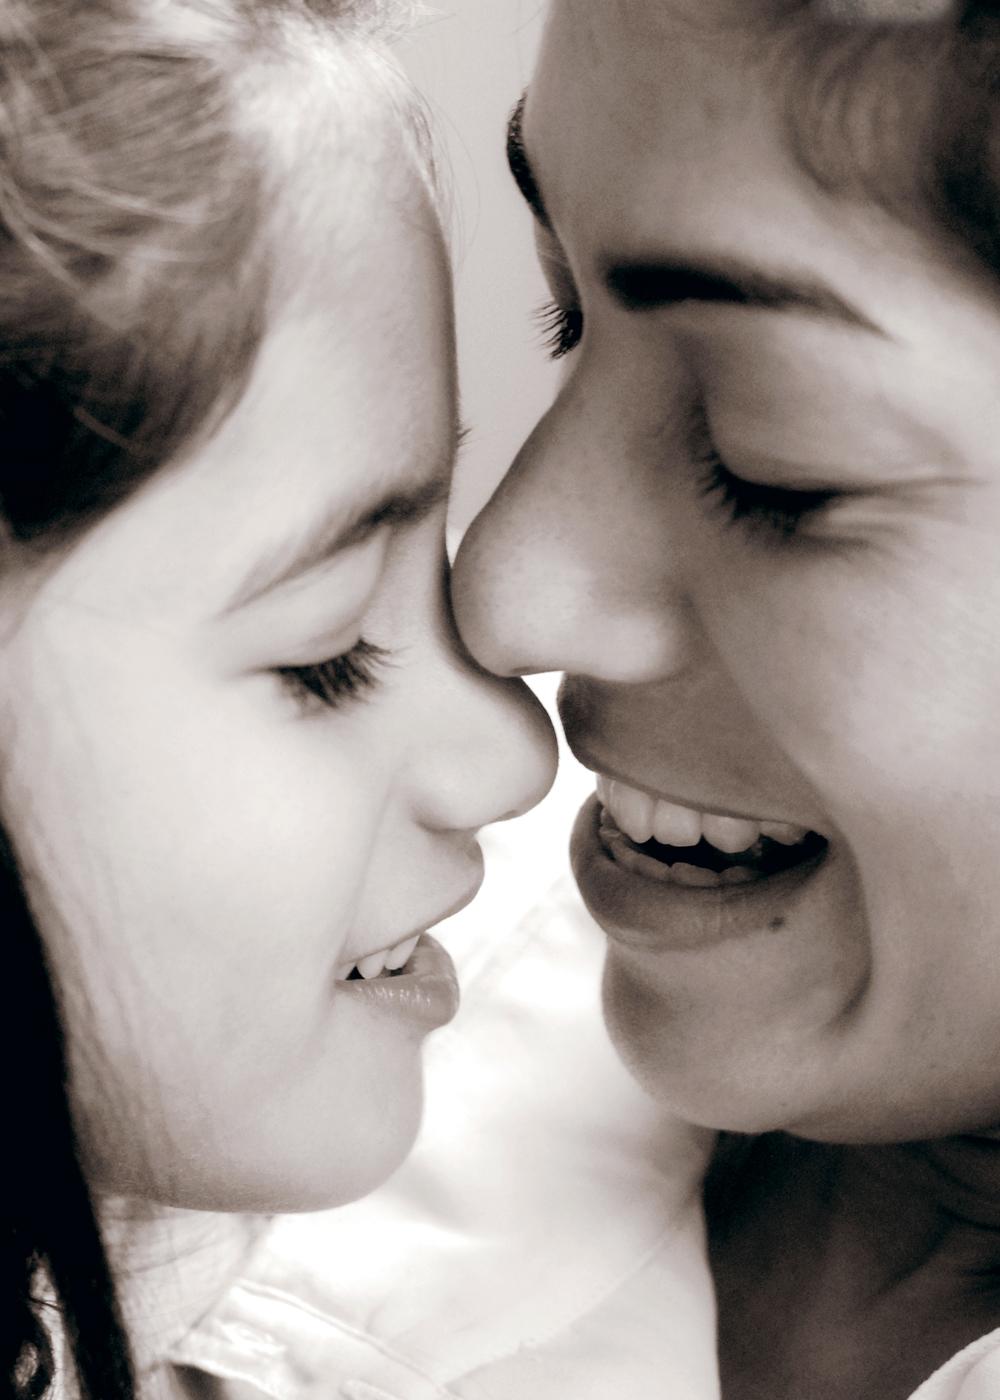 _DSC0252 rhea anjuli nose kiss cepia 5x7.jpg